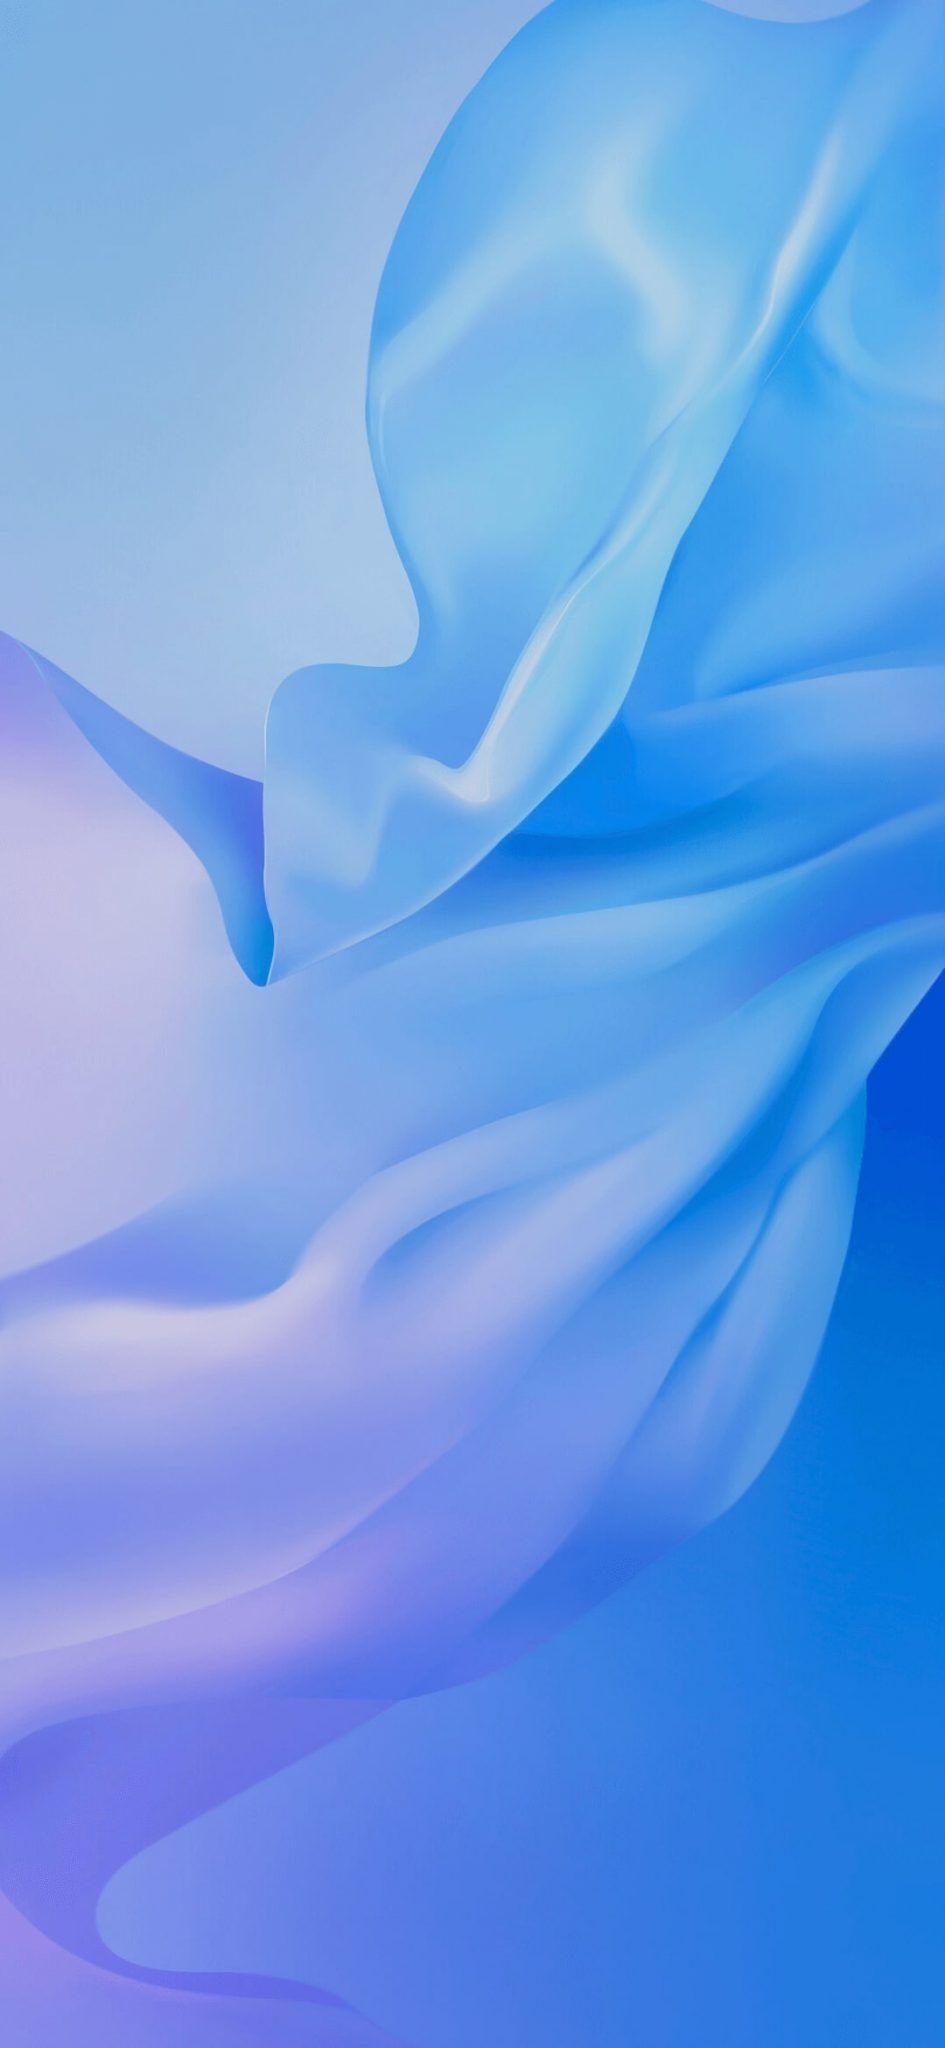 Download Vivo V17 Stock Wallpapers Full Hd Droidviews In 2021 Stock Wallpaper Huawei Wallpapers Galaxy Phone Wallpaper Aesthetic beautiful vivo wallpaper